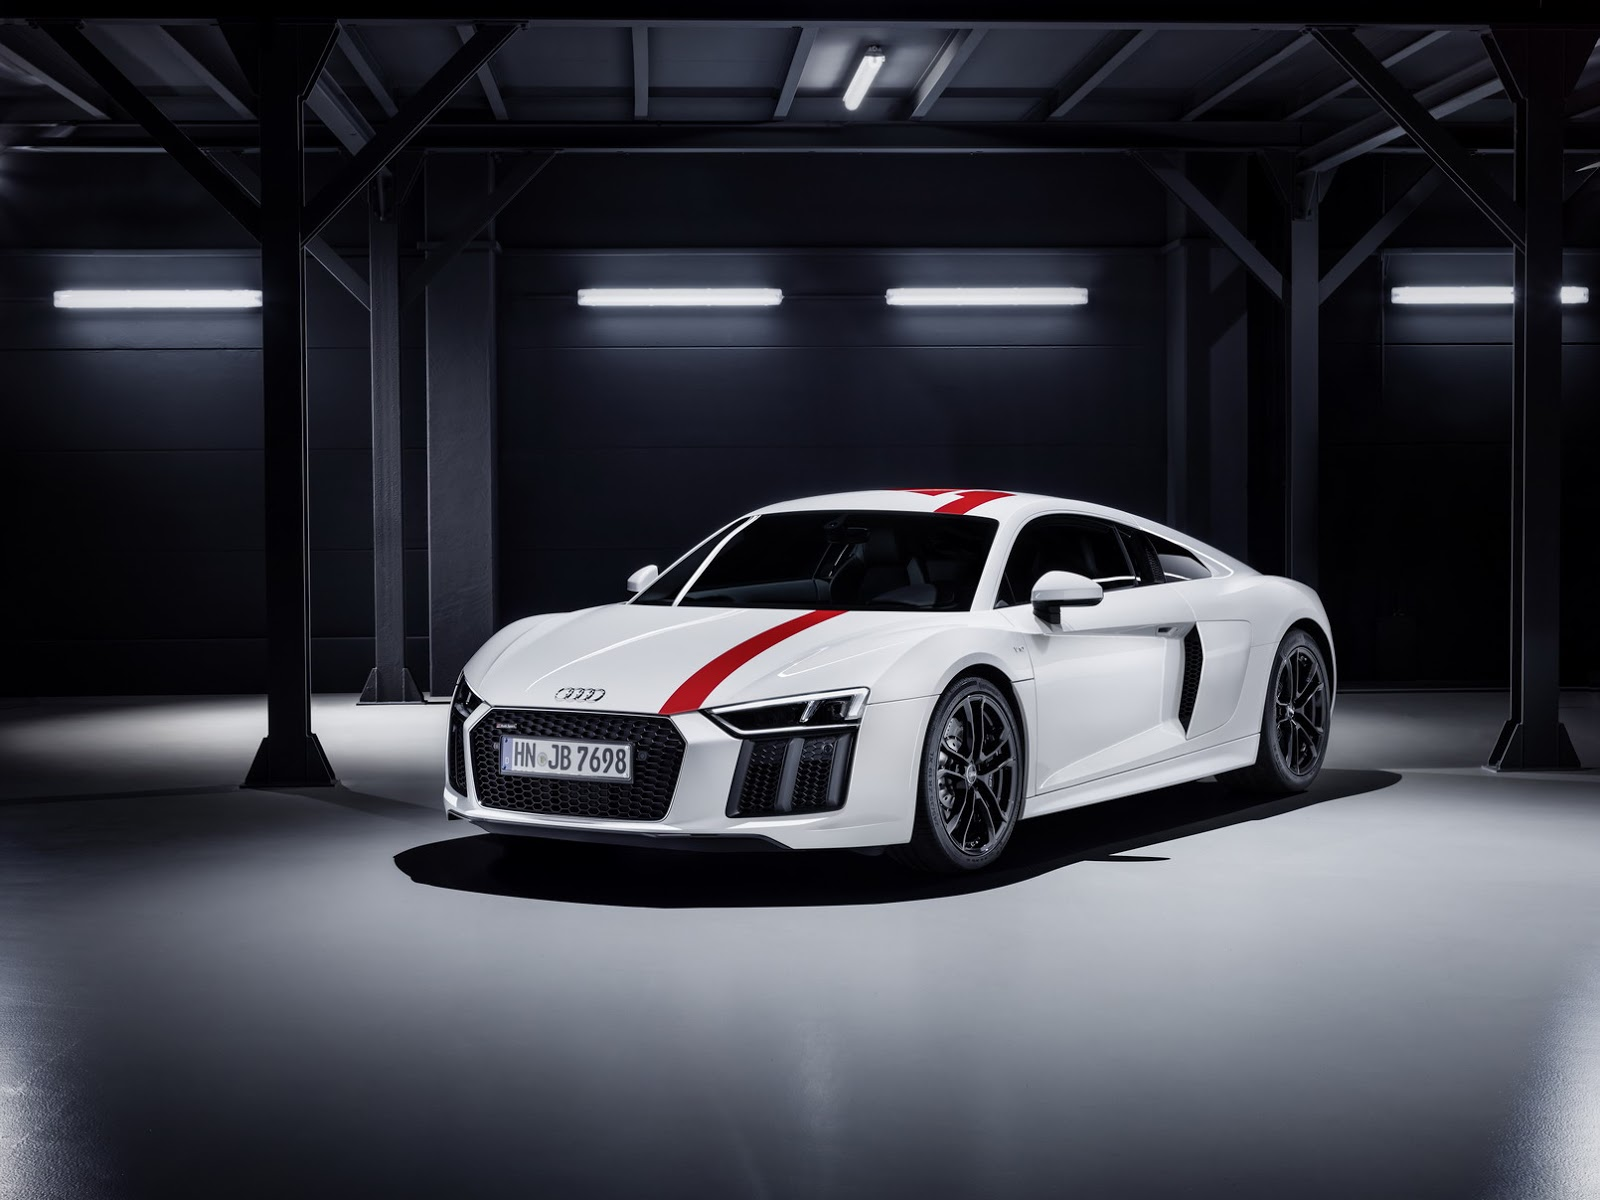 2018_Audi_R8_V10_RWS_41